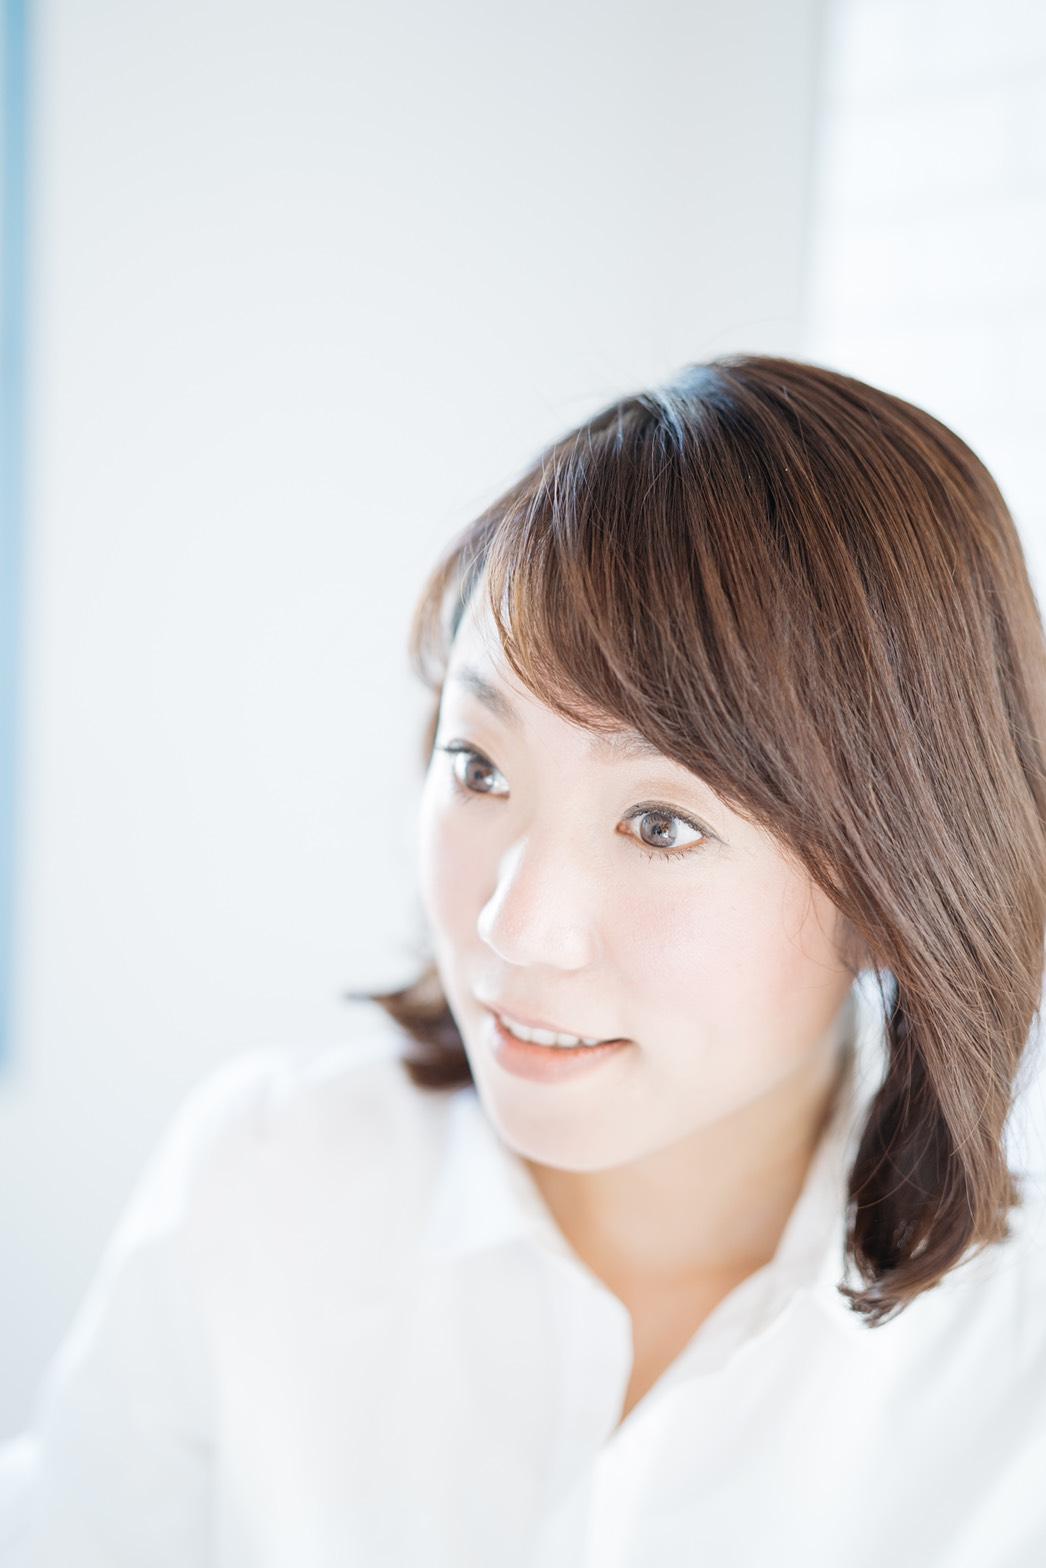 musubi+ (むすびぷらす)erikoの写真